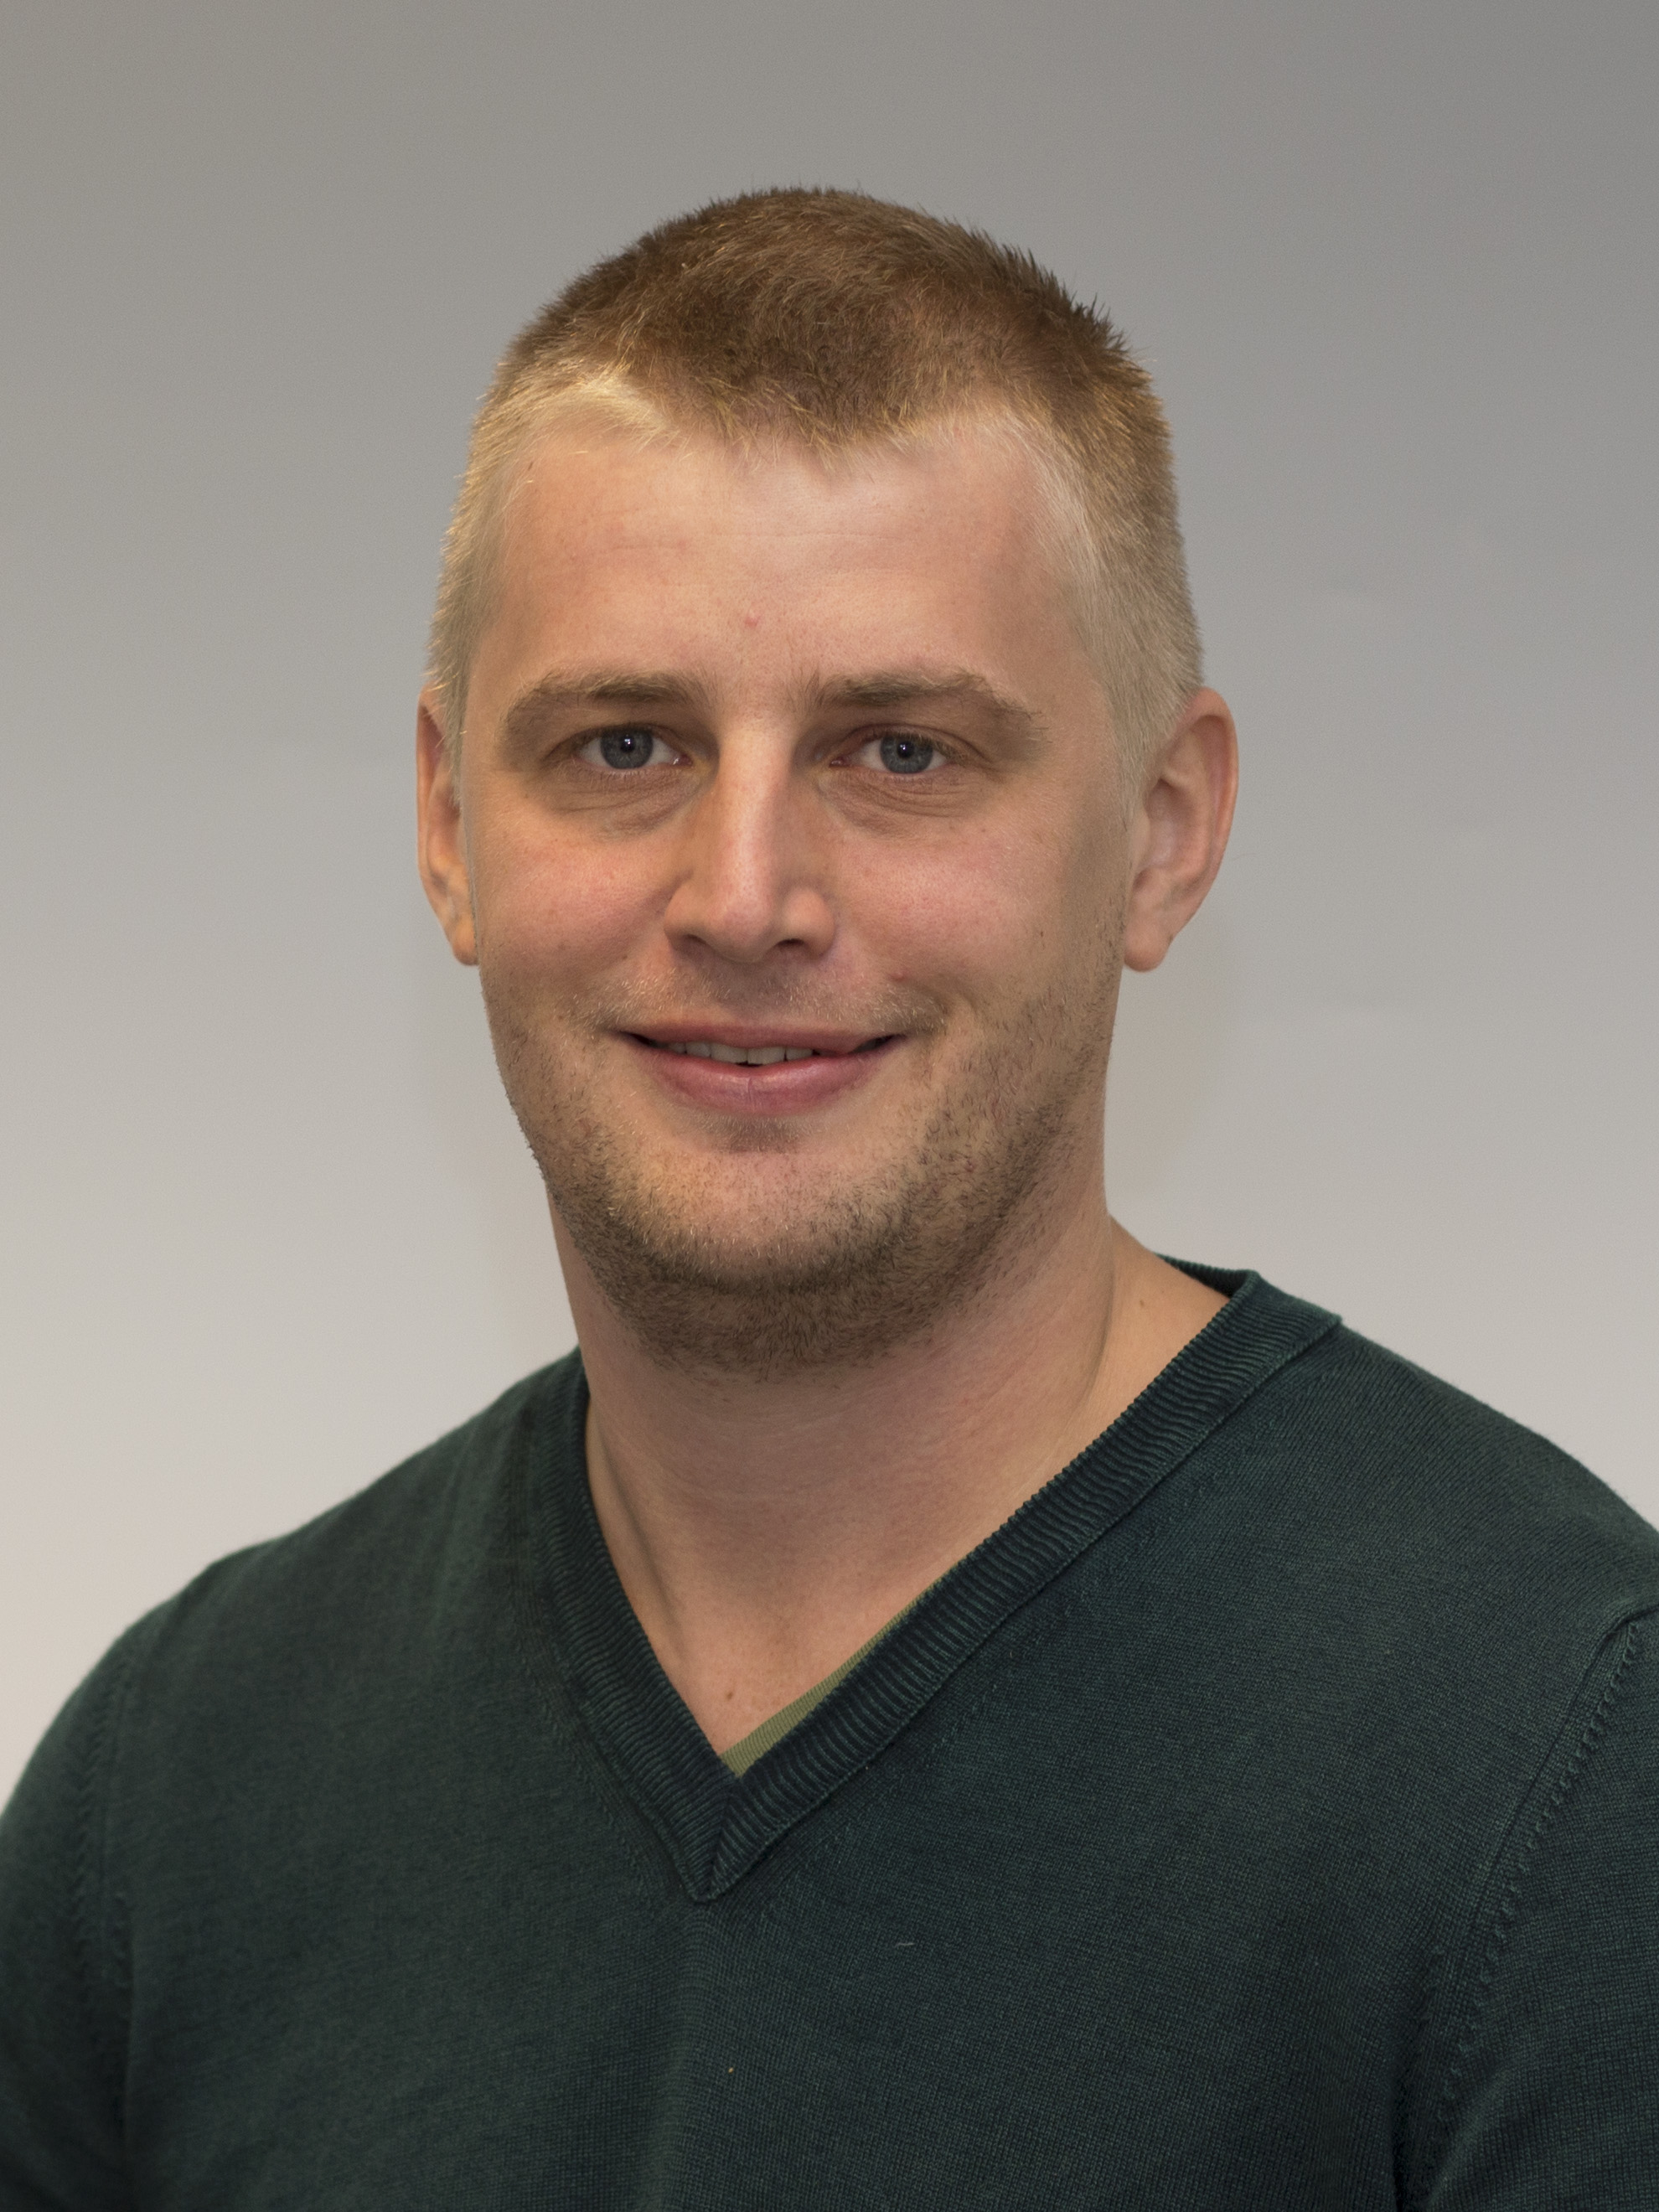 Mathias Wessel Tromborg